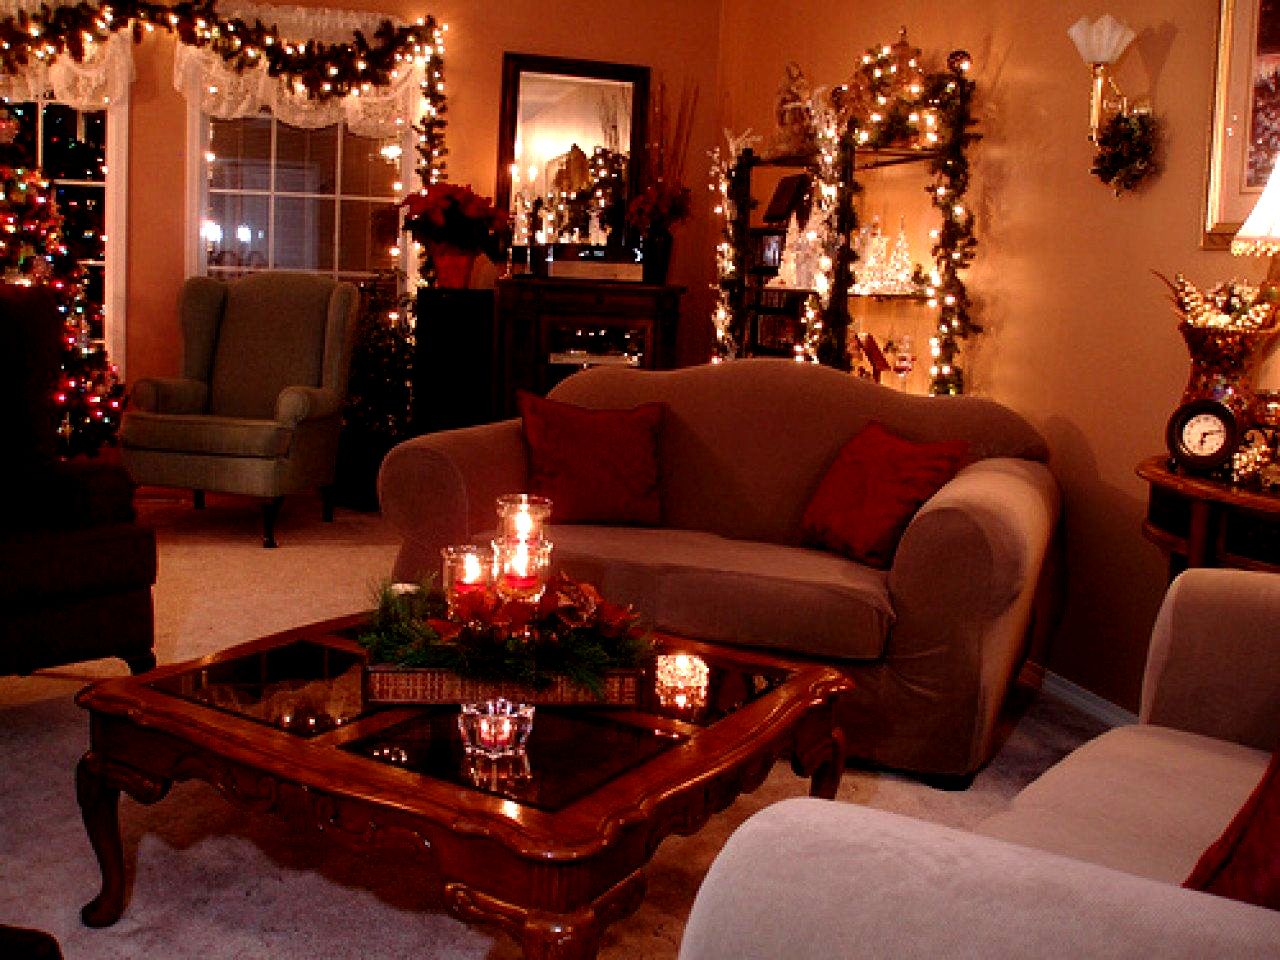 Modern Living Room Decorating Ideas Christmas Table Centerpiece Ideas Christmas Coffee Table Decor Coffee Table Centerpieces Christmas Decorations Living Room